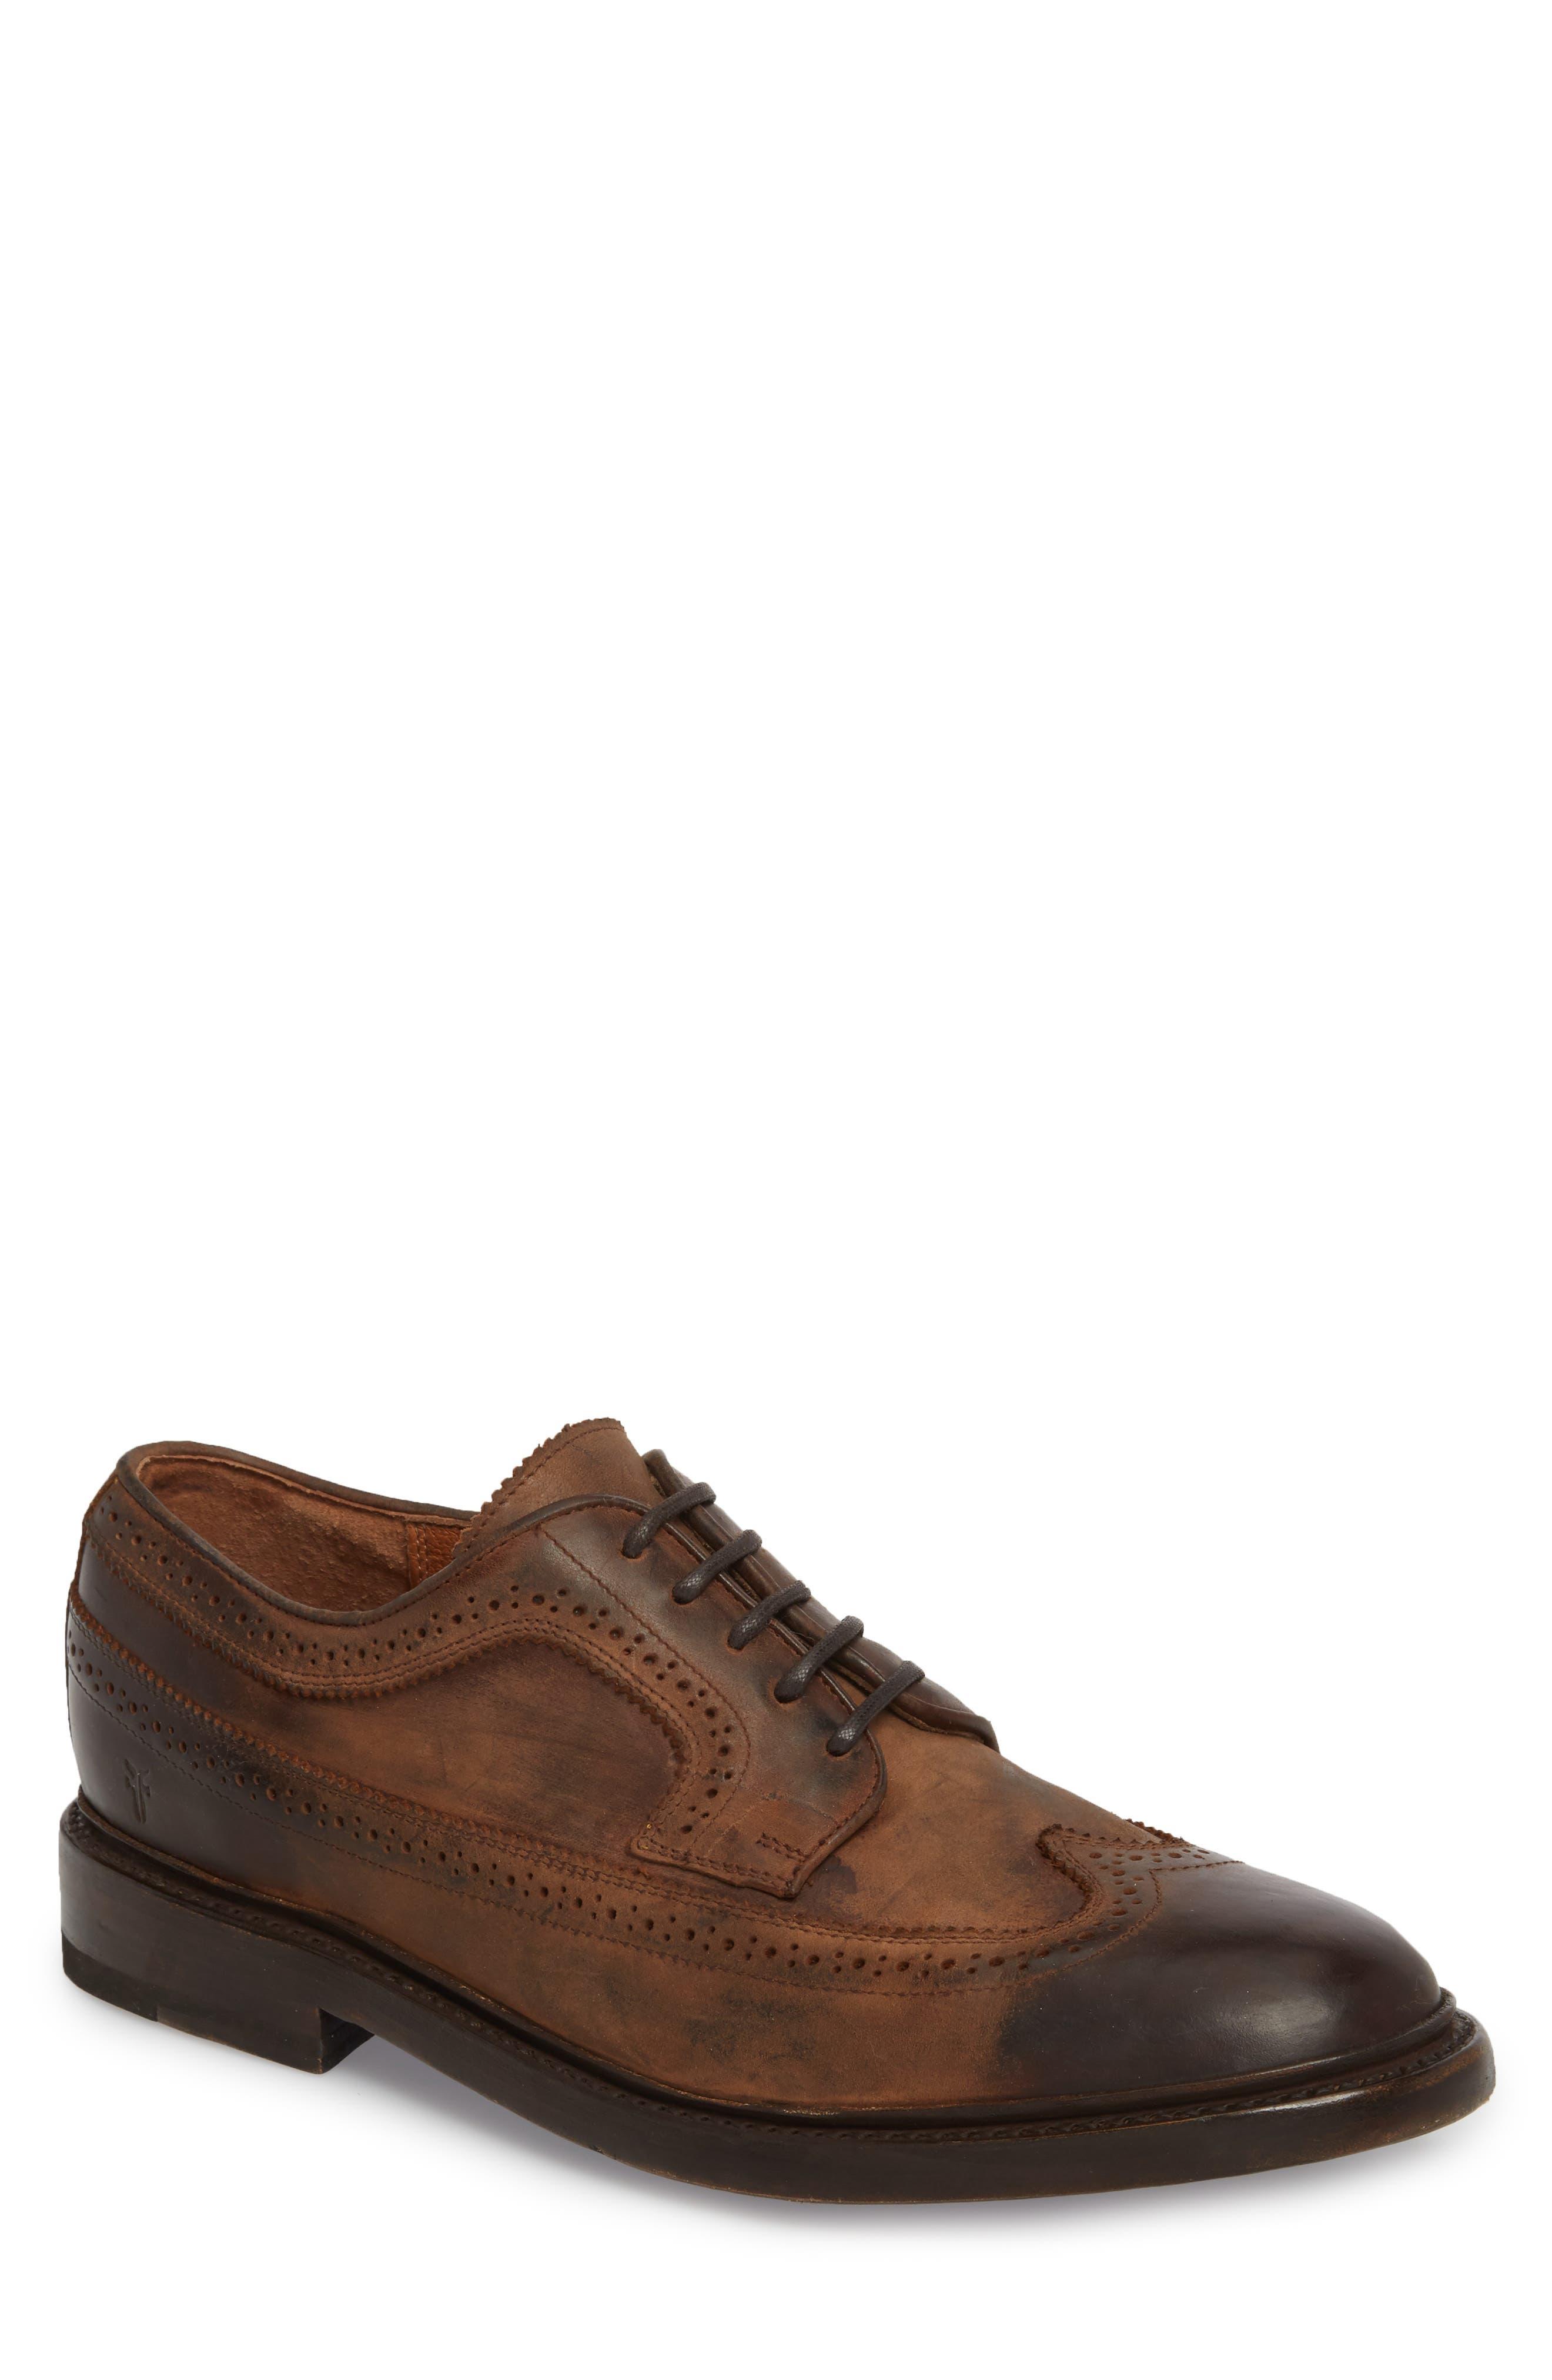 Jones Wingtip,                             Main thumbnail 1, color,                             Redwood Leather